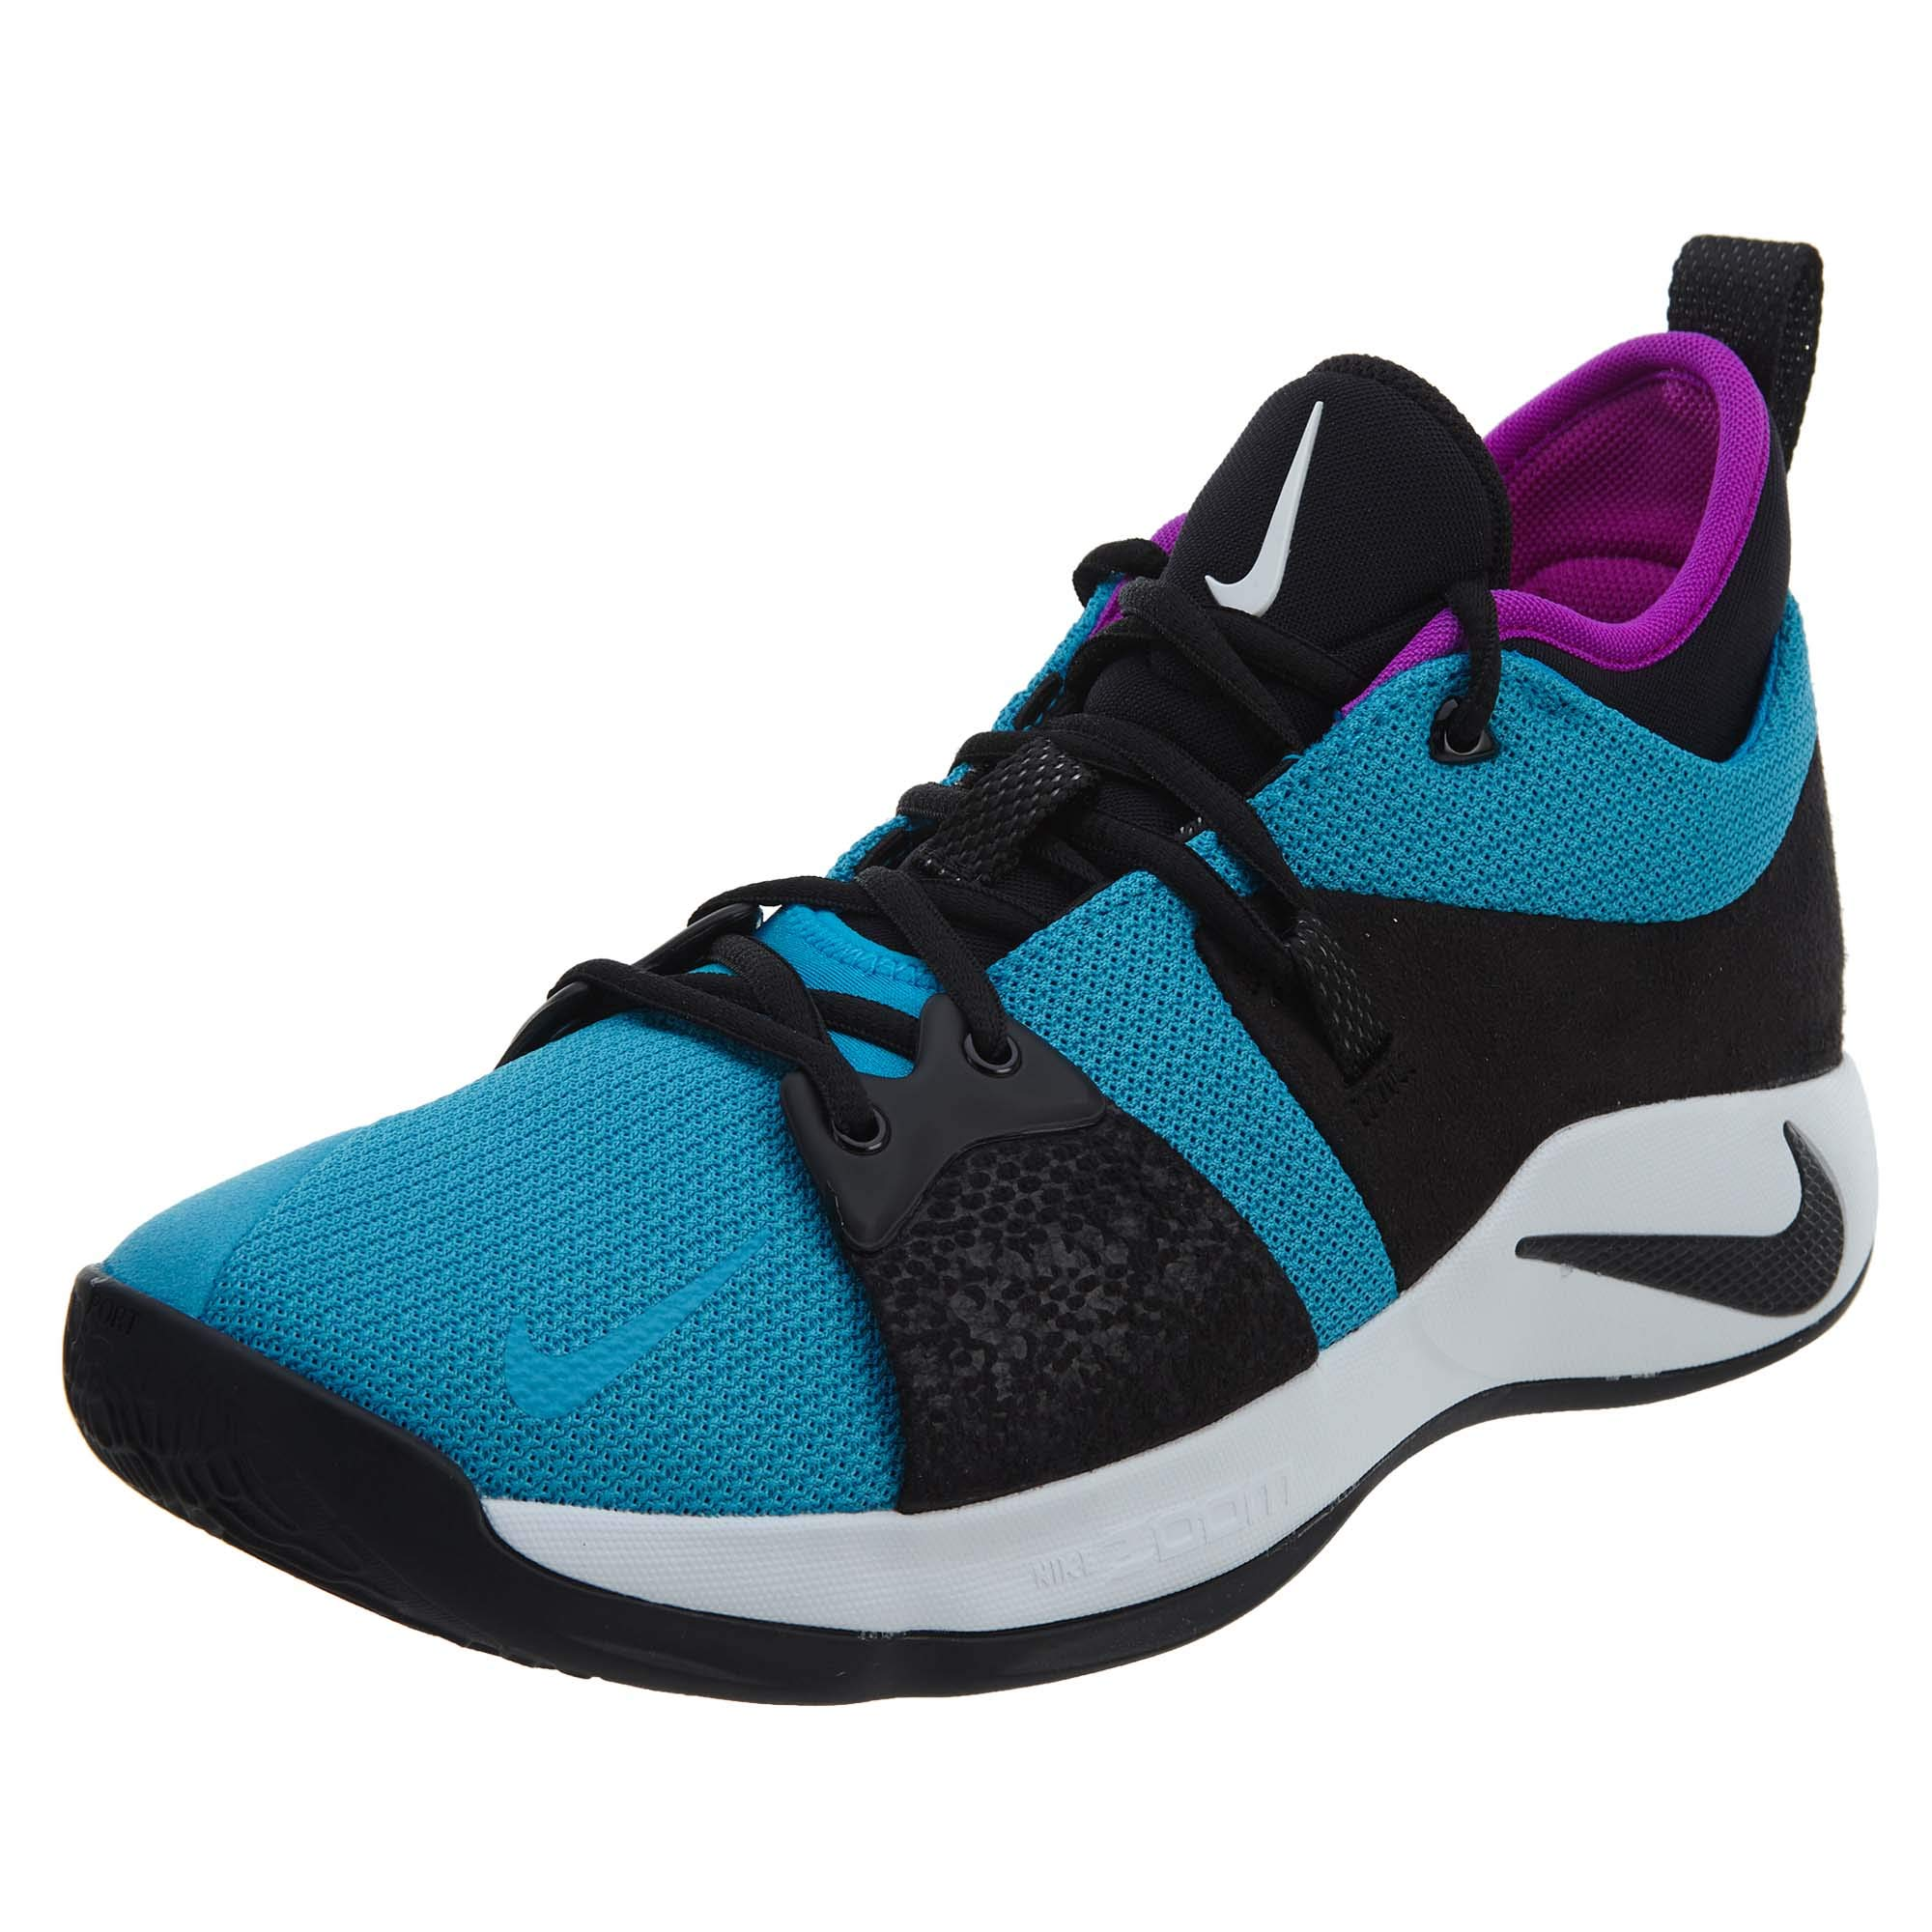 06e98e26ef7 Galleon - Nike Men s PG 2 Basketball Shoe Blue Lagoon Black Violet (10 D(M)  US)